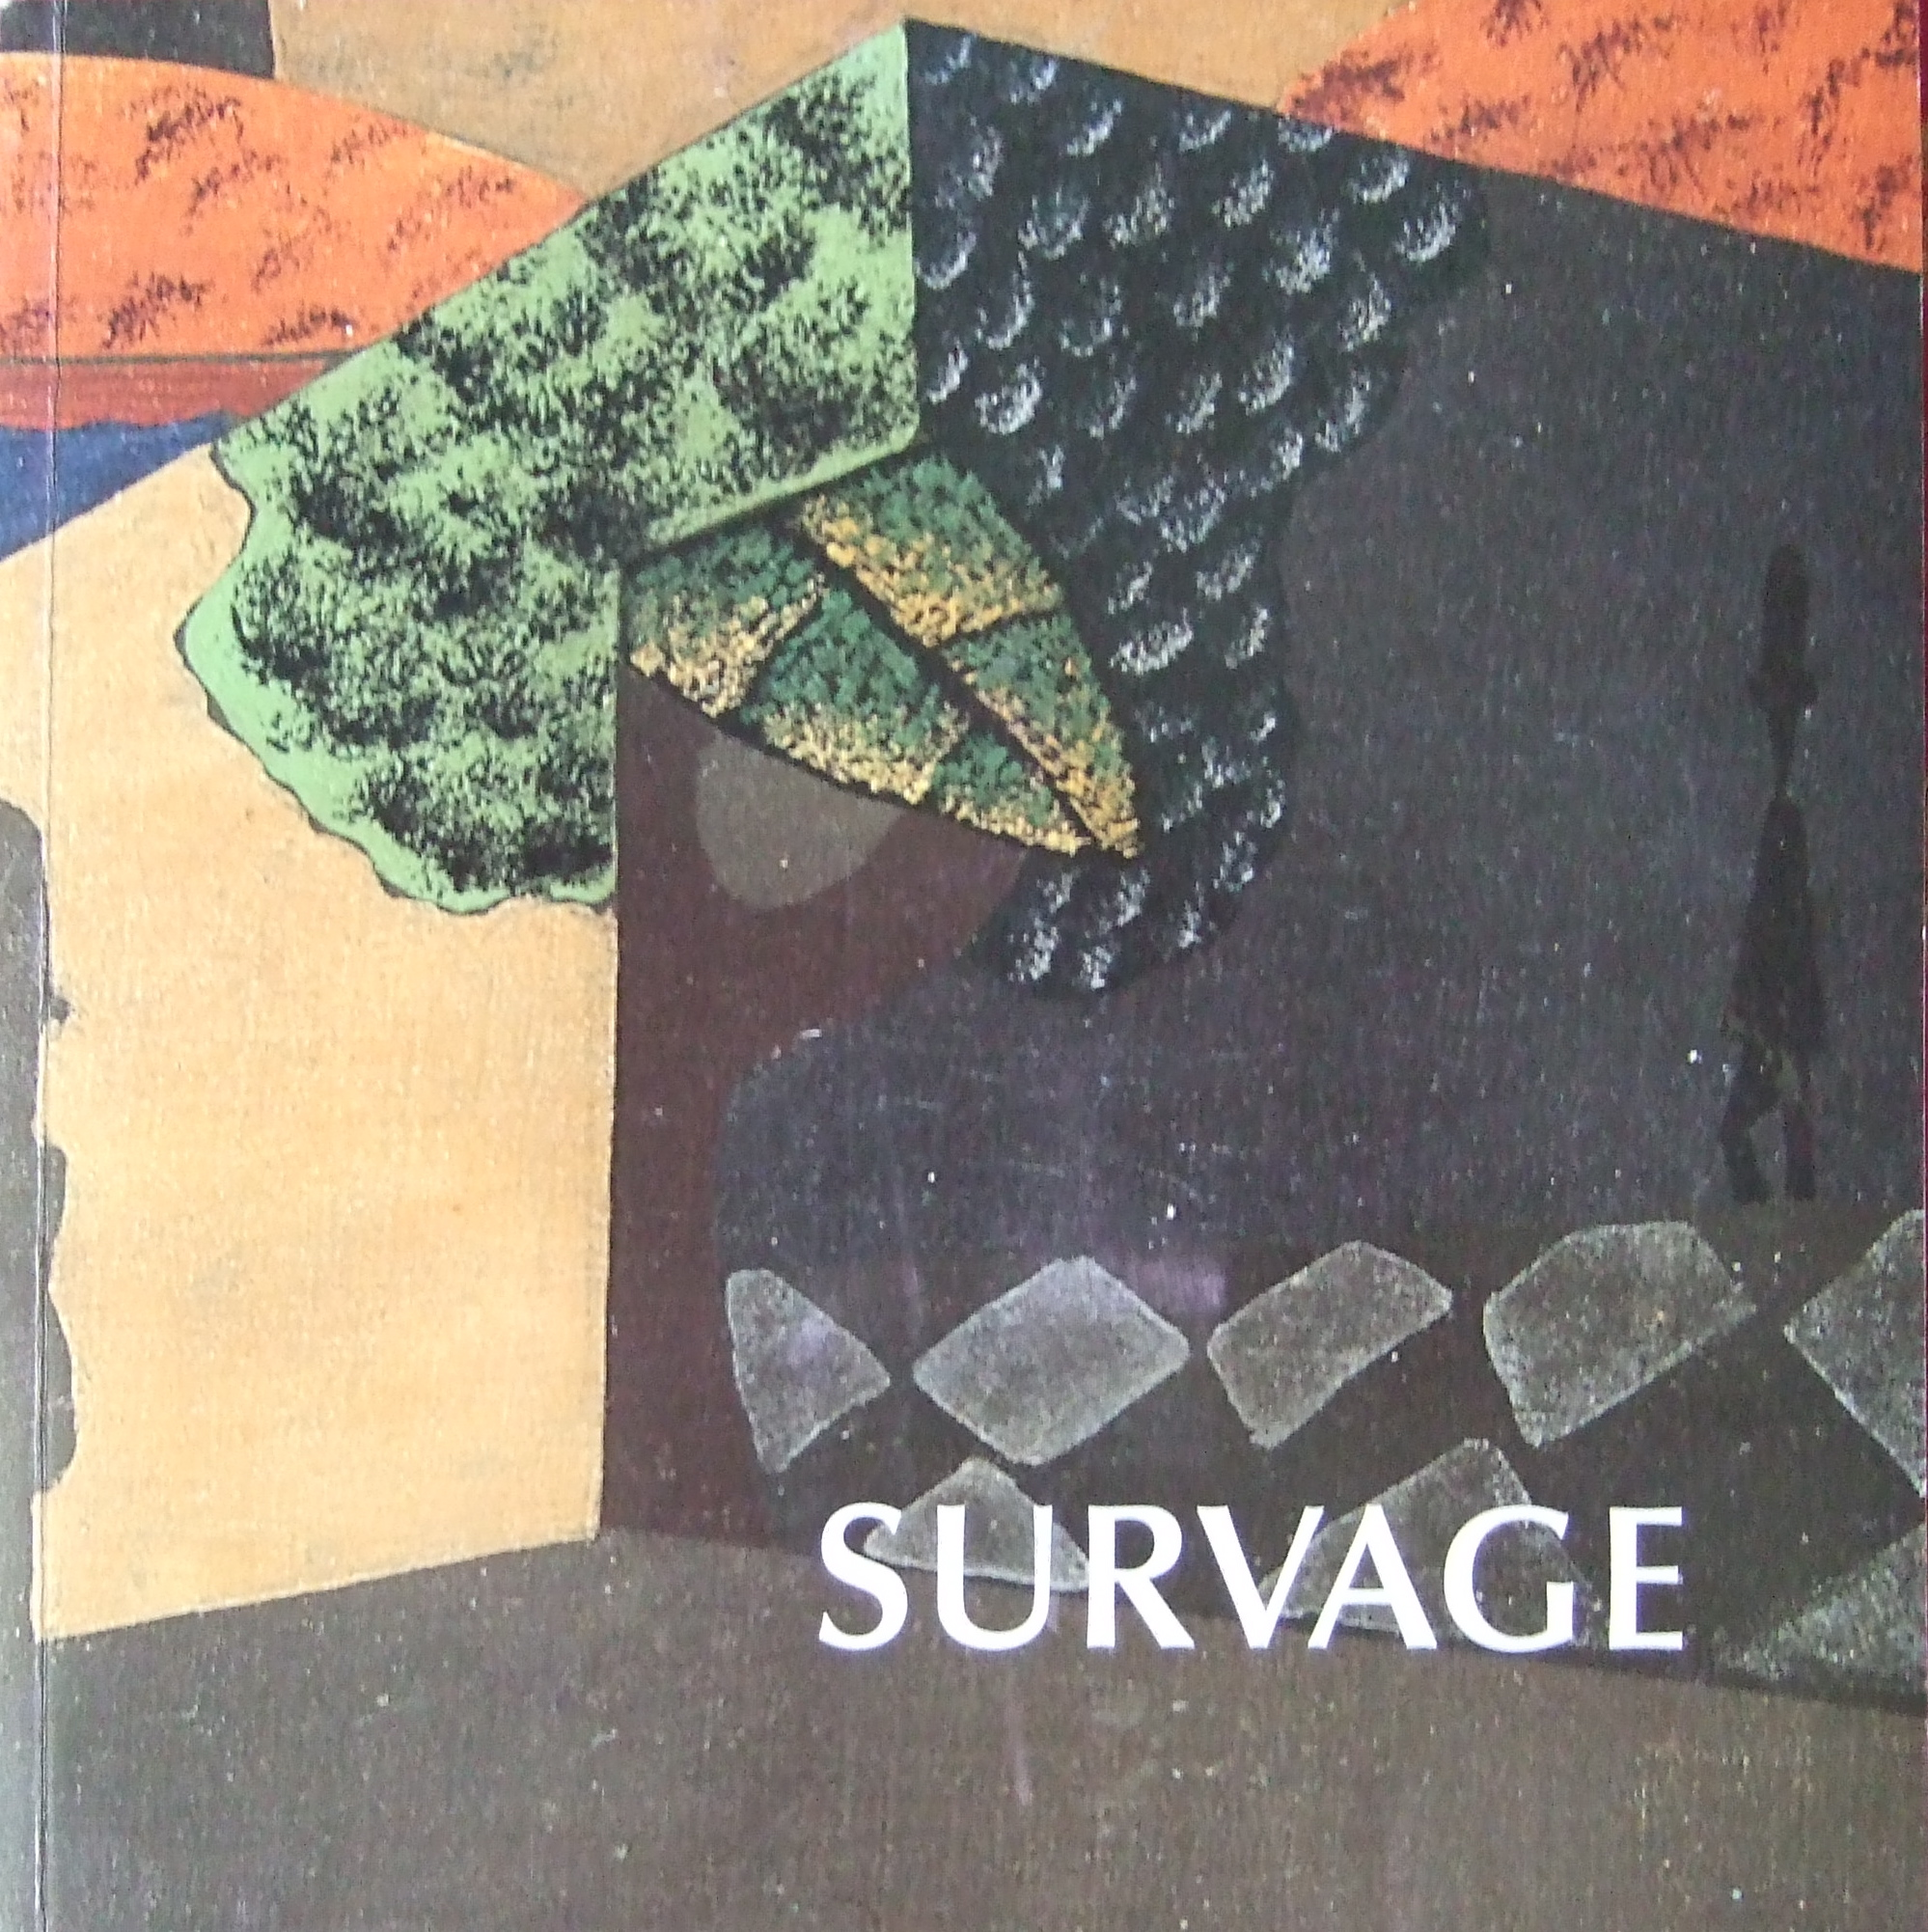 Survage. Exposition Galerie Zlotowski.